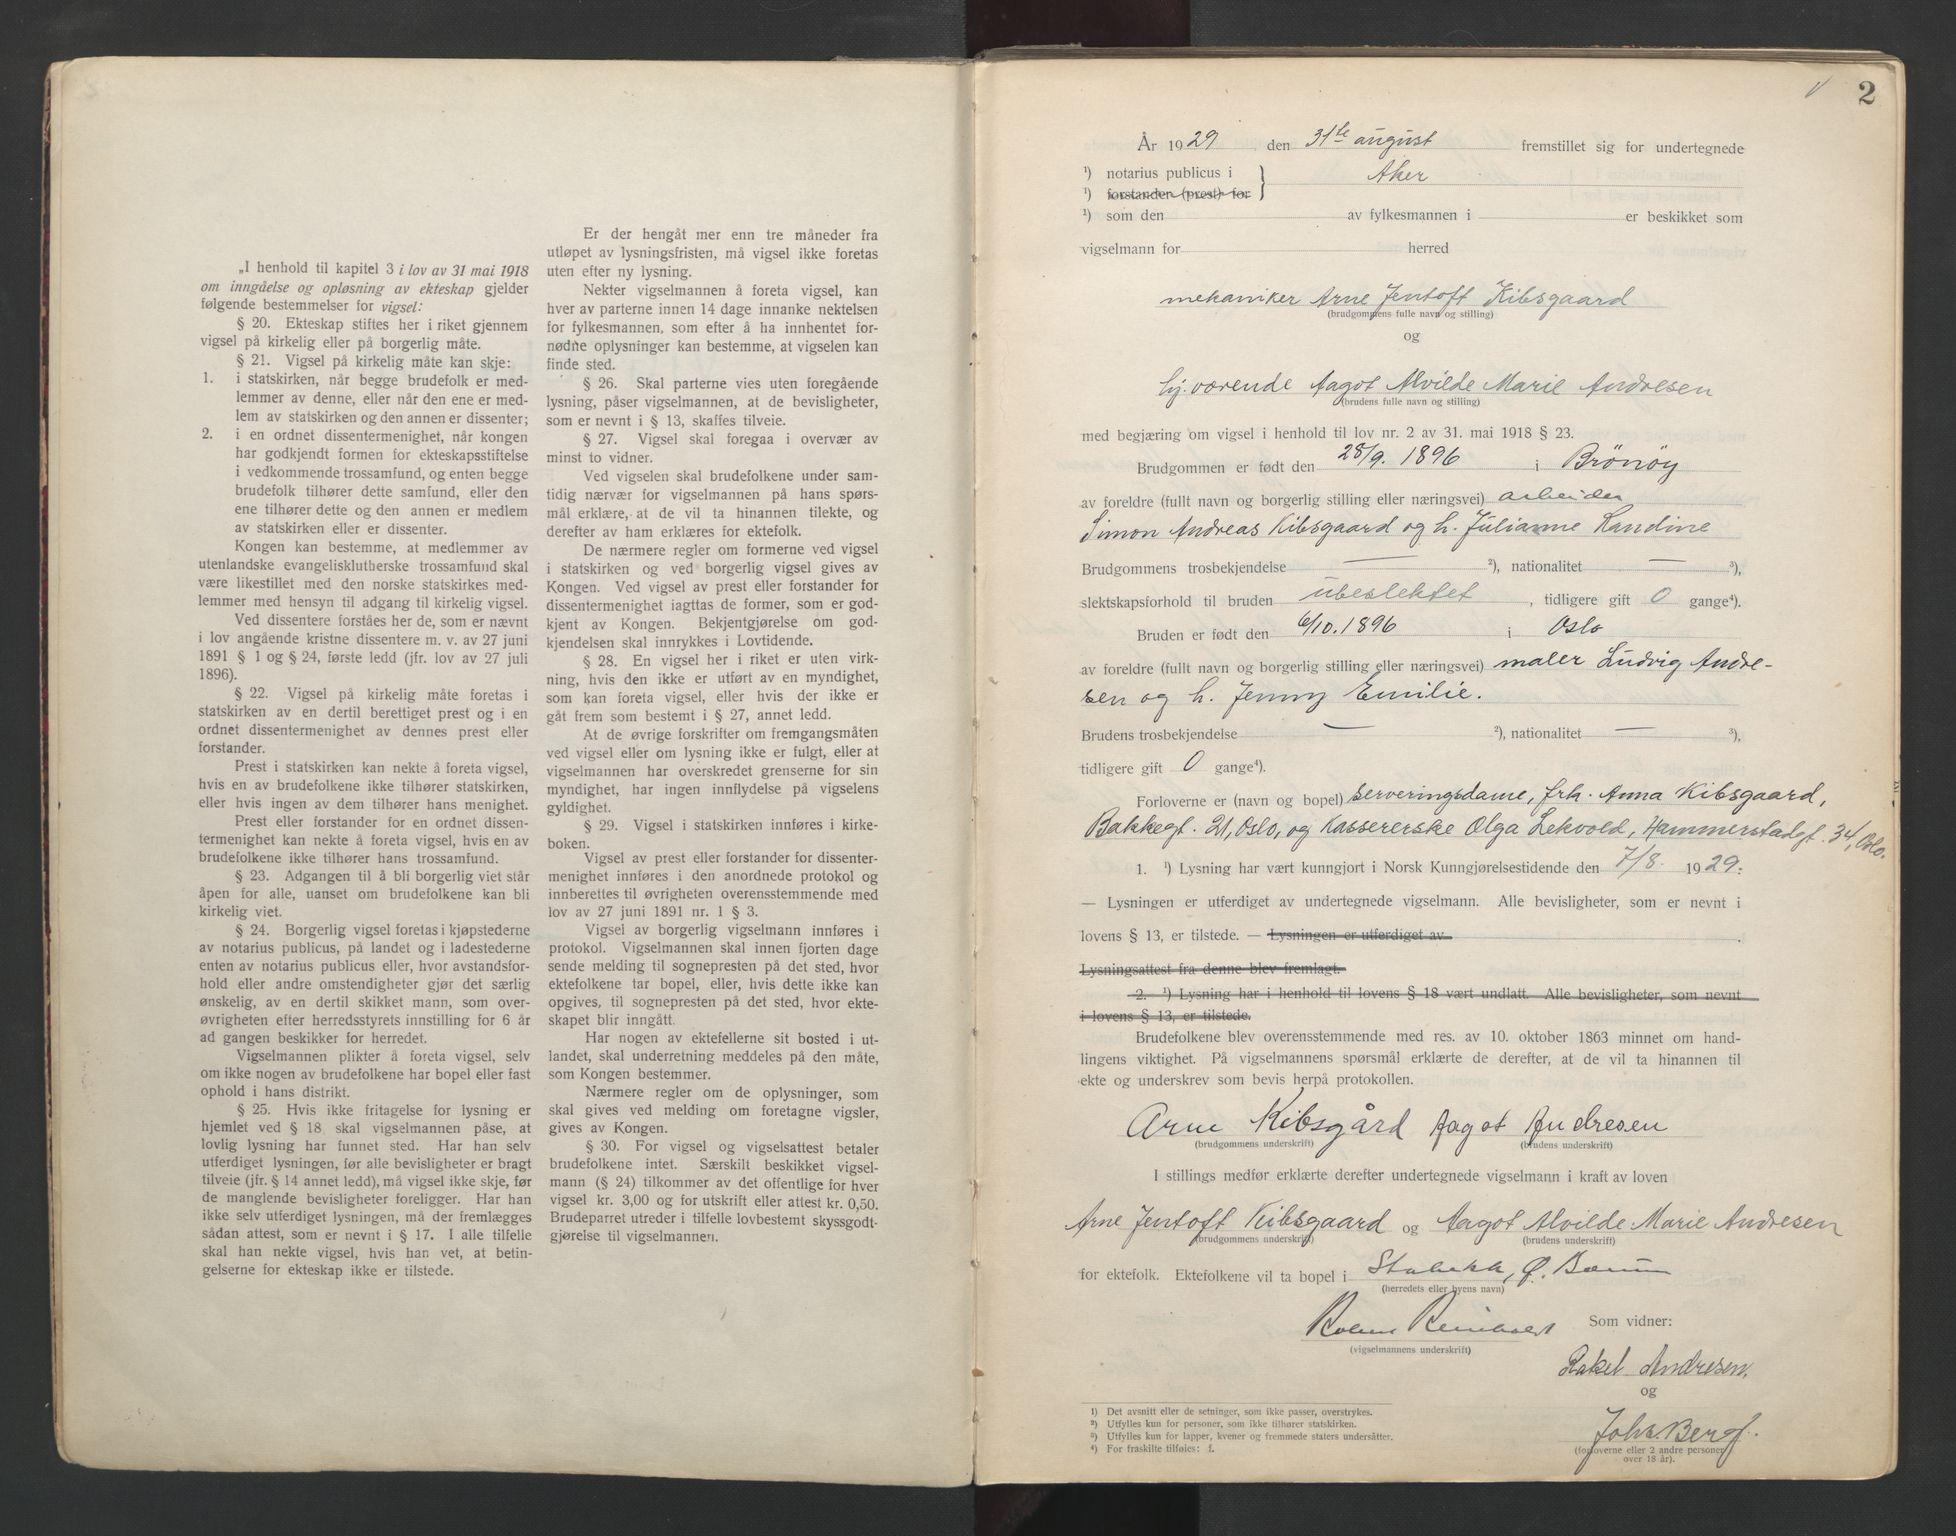 SAO, Aker sorenskriveri, L/Lc/Lcb/L0005: Vigselprotokoll, 1929-1931, s. 2